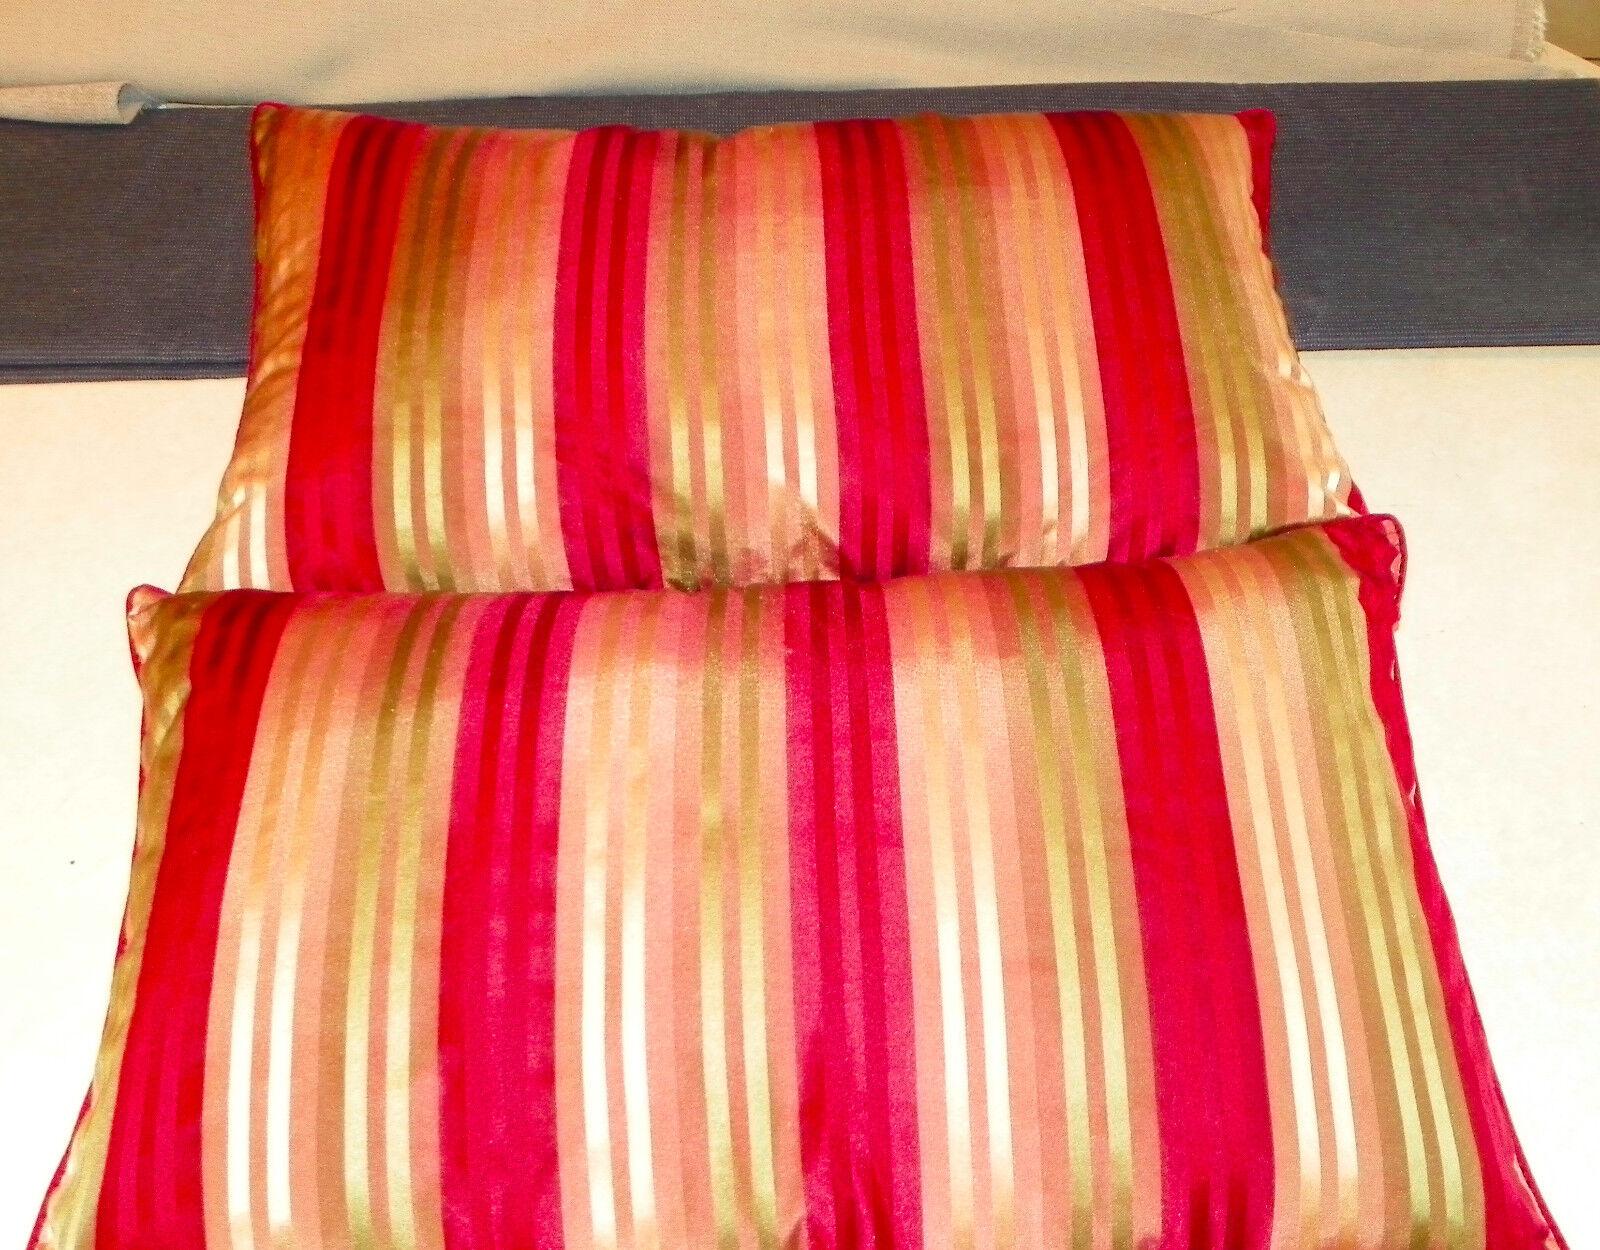 Pair of rouge vert or Satin Stripe Print Bolster   Lumbar Pillows  23  x 14